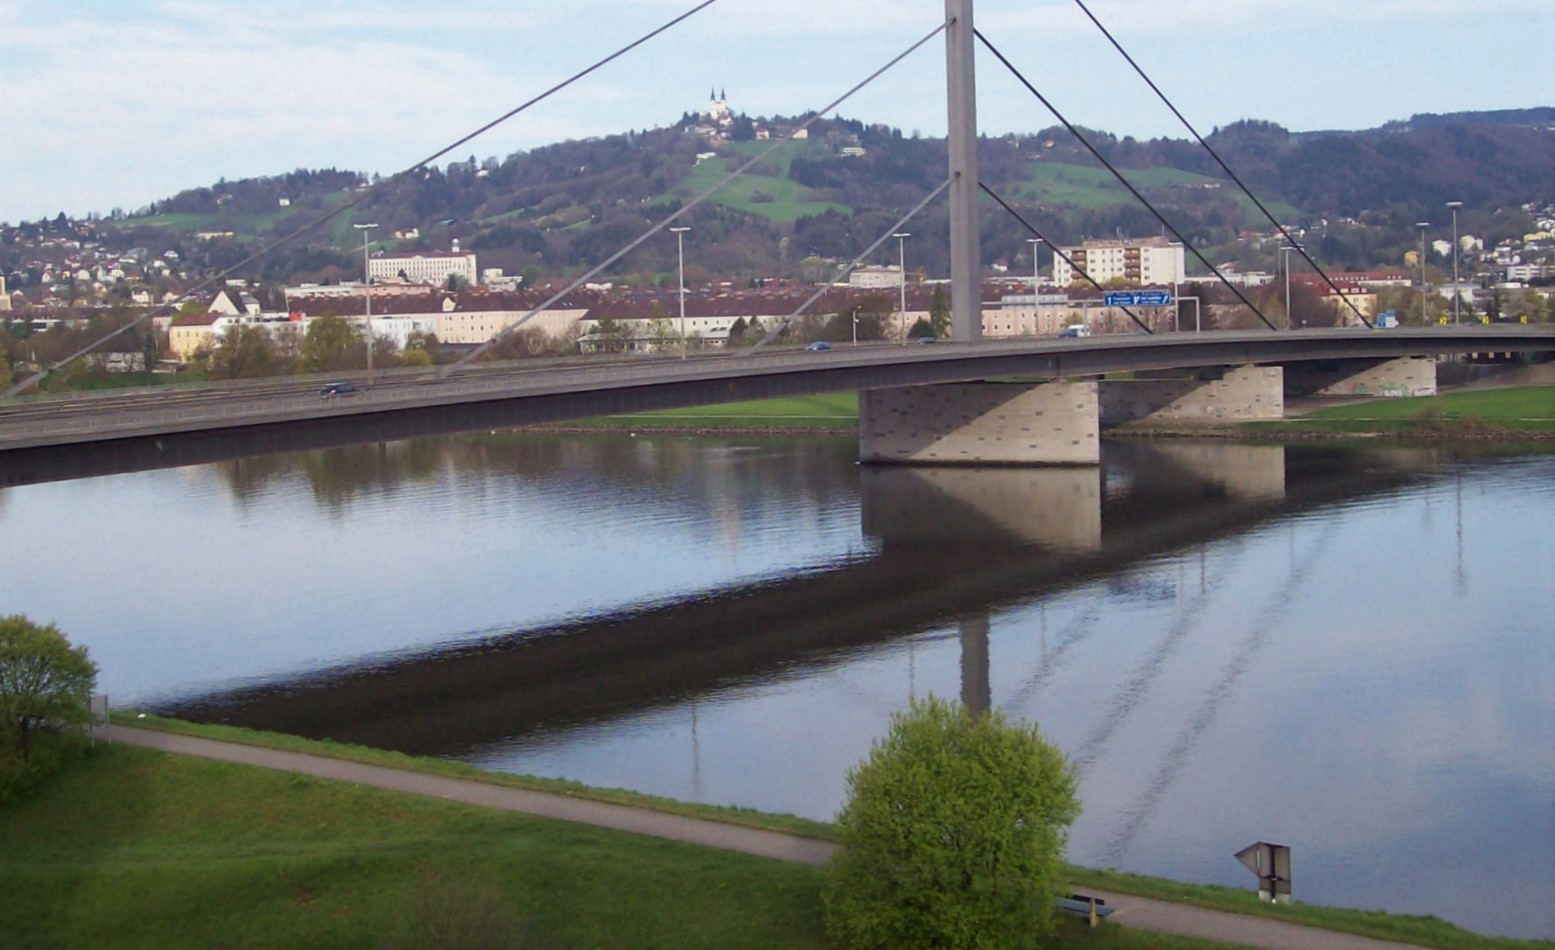 Autobahnbrücke Linz mit Pöstlingsberg